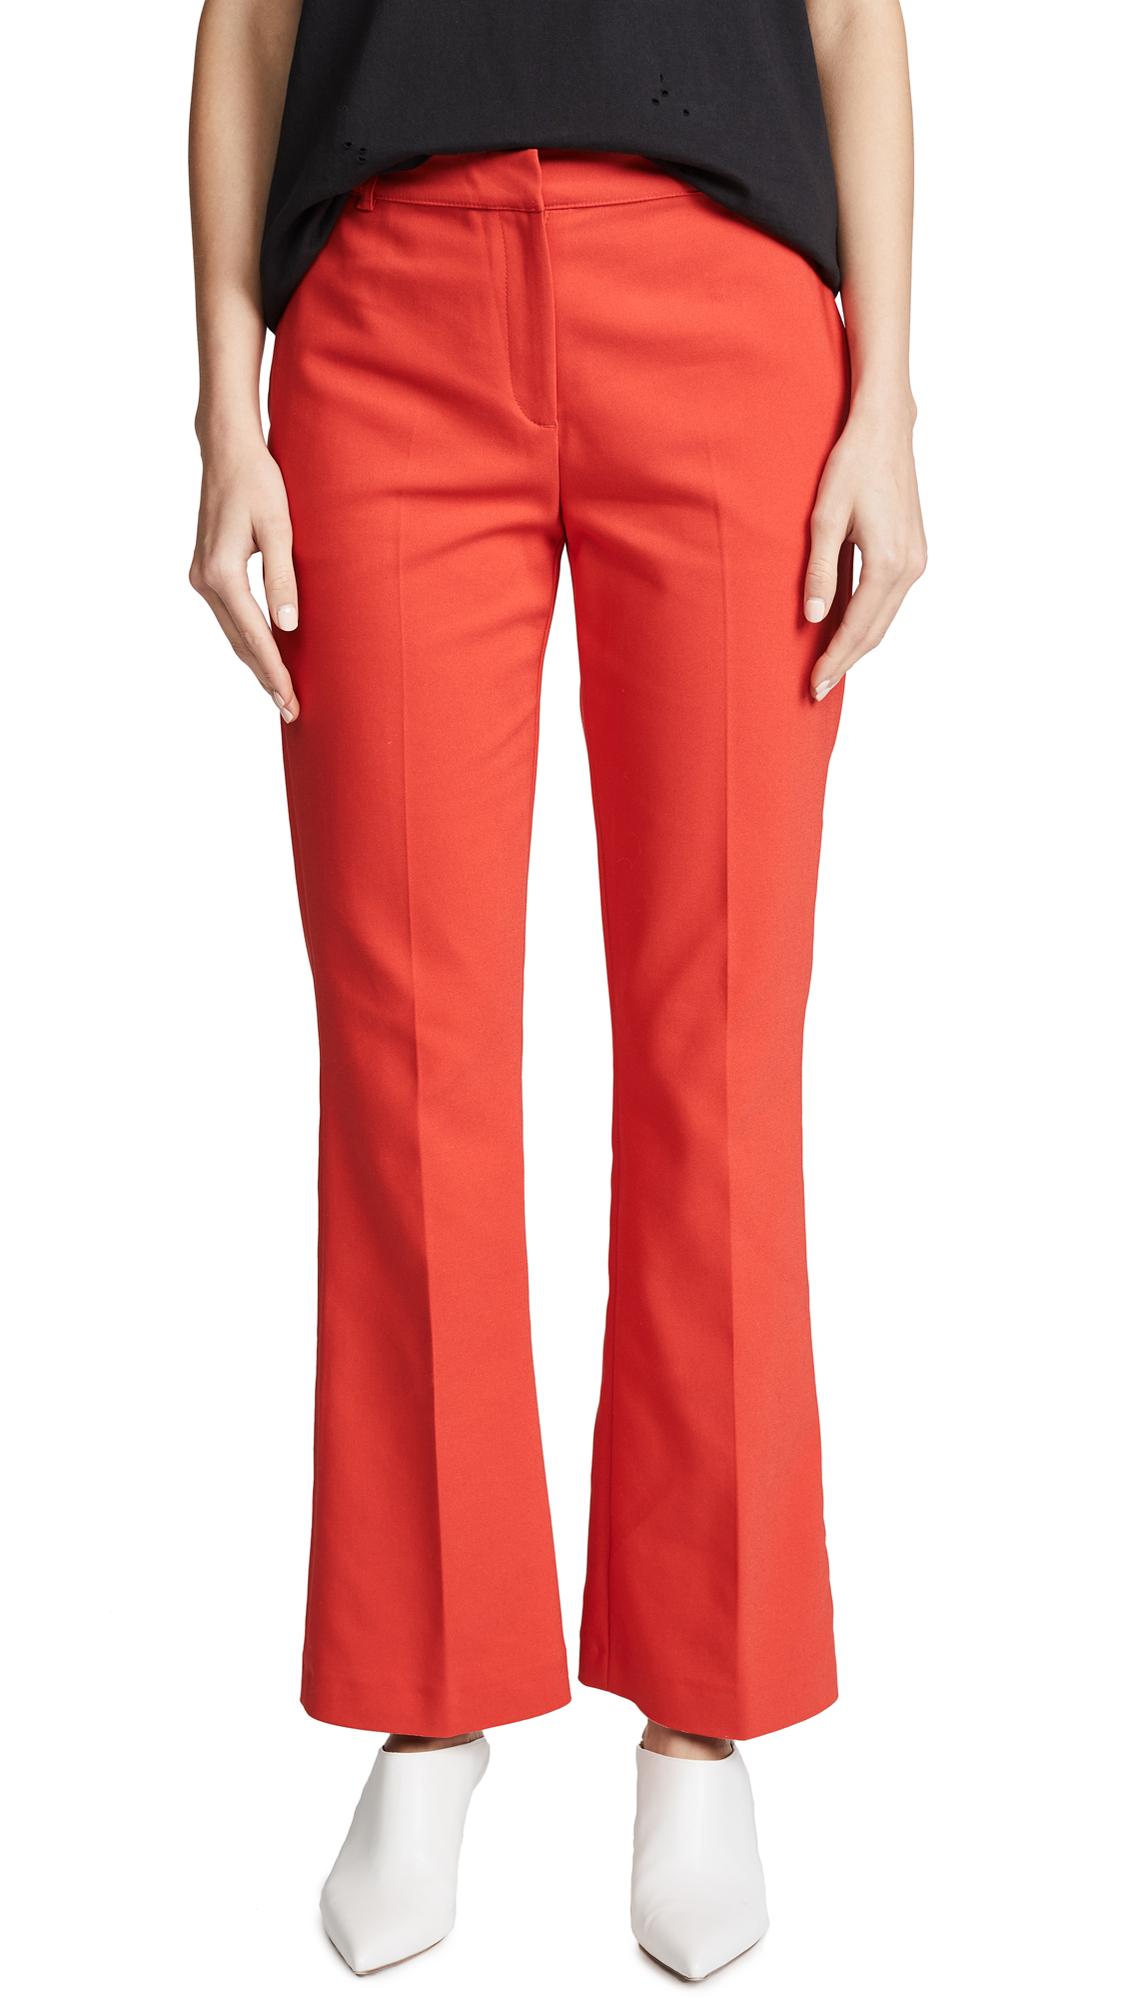 Frankie Pants In Red. Pantalons Frankie En Rouge. - Size Xs (also In L,m,s) Anine Bing - Taille Xs (également En L, M, S) Anine Bing